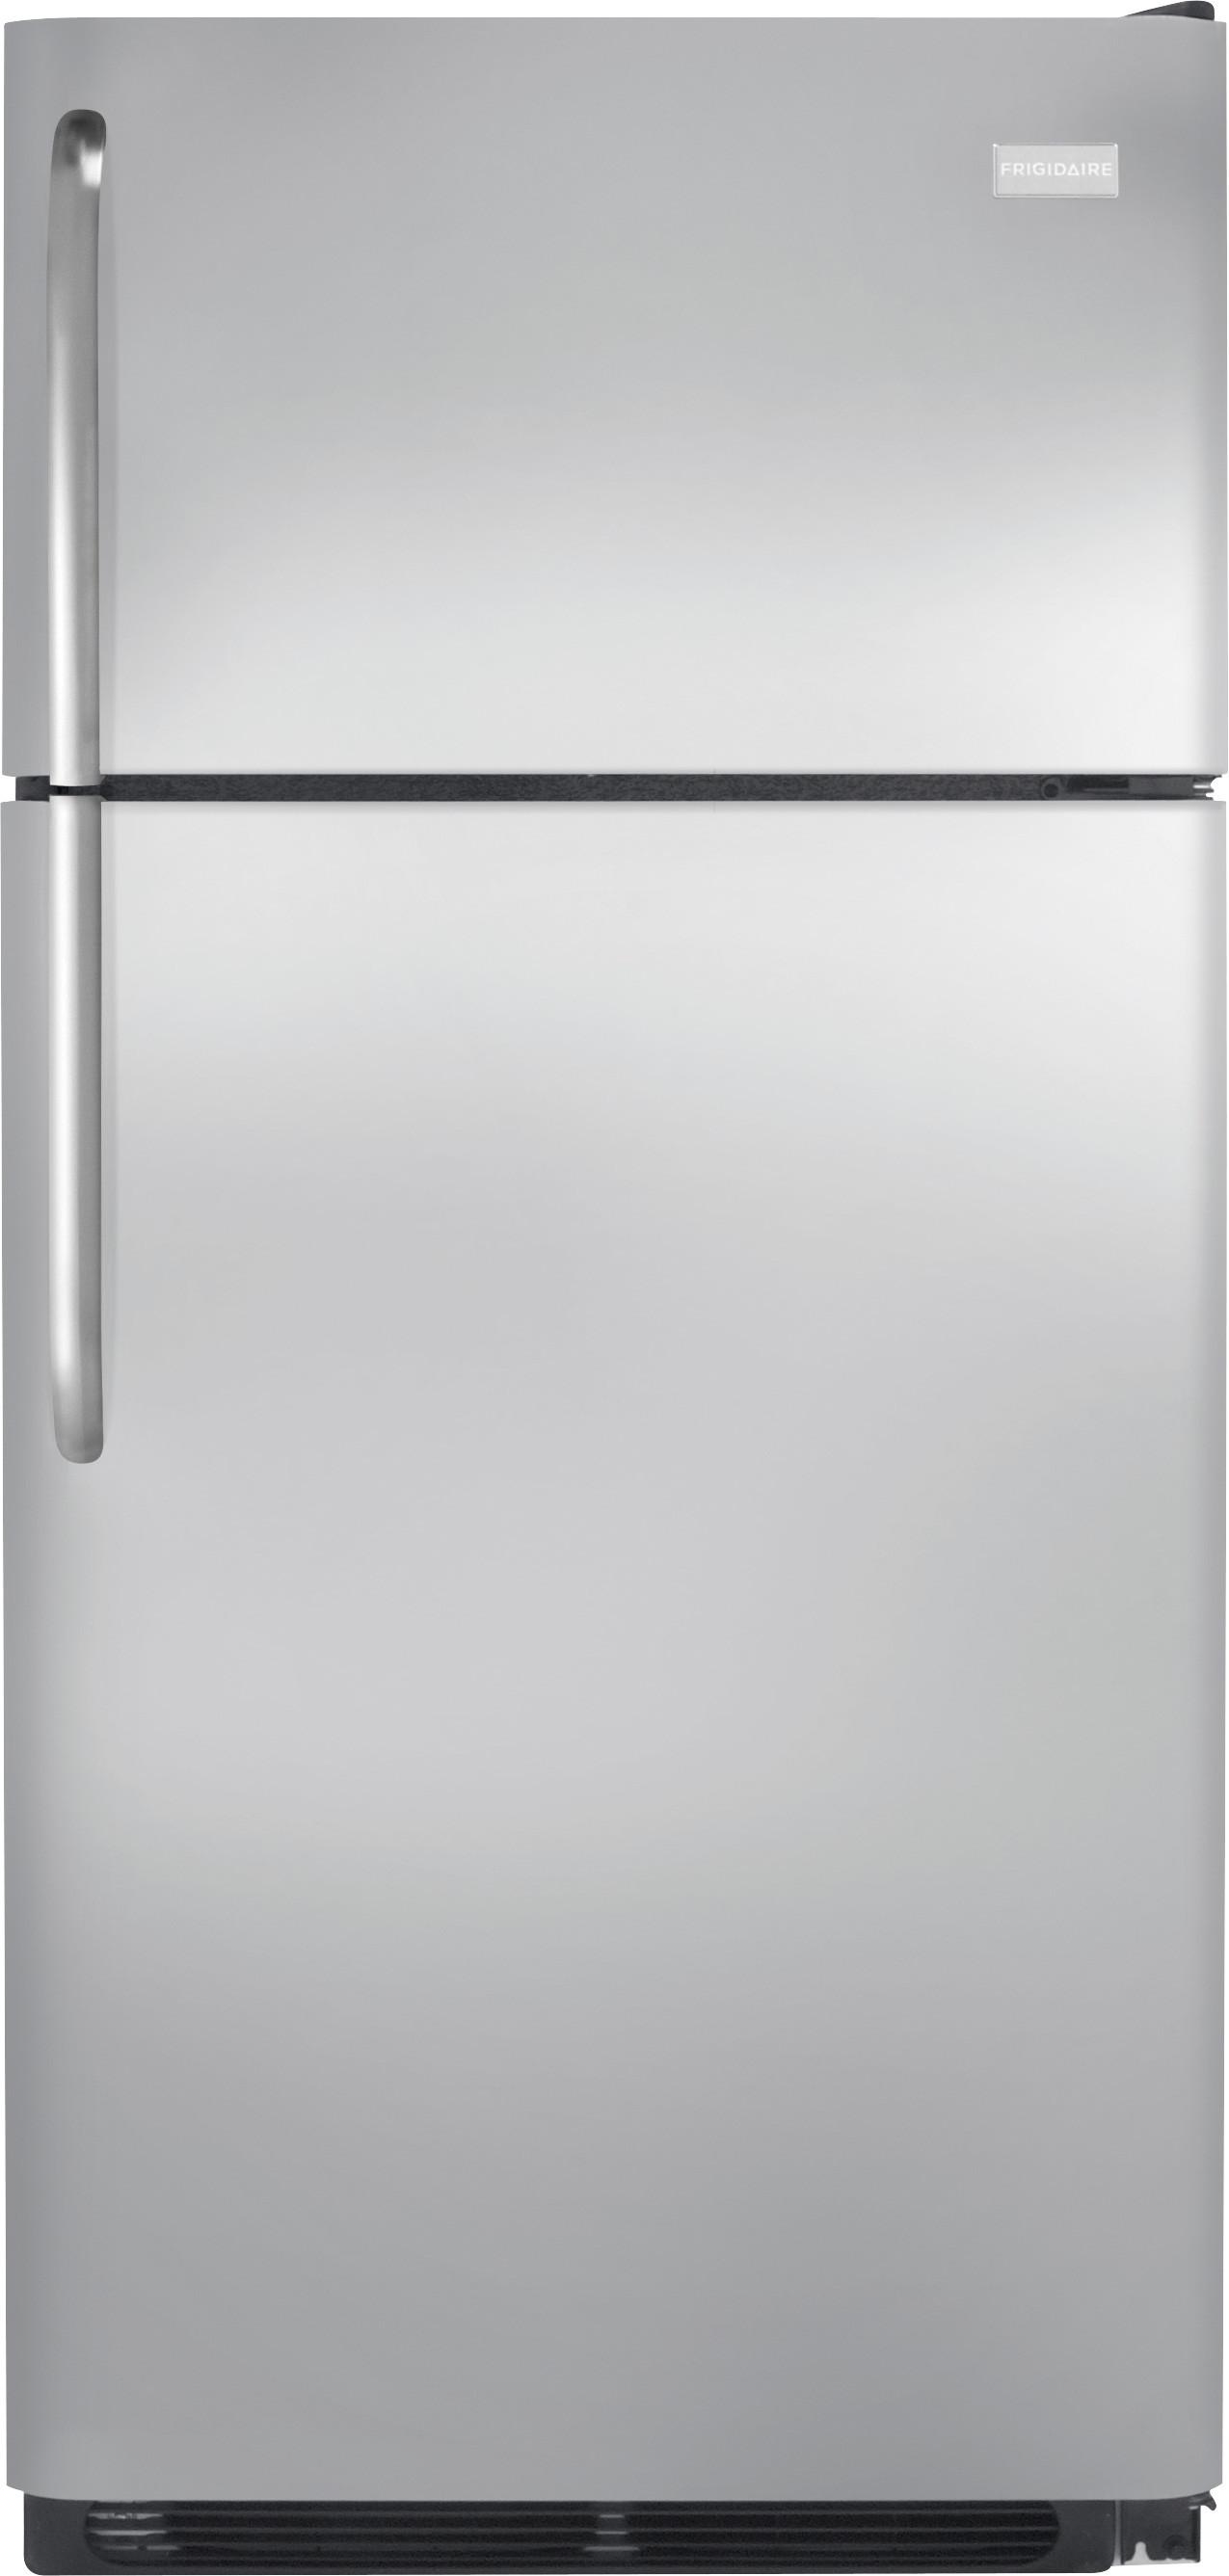 Frigidaire Fftr18g2q 30 Inch Top Freezer Refrigerator With